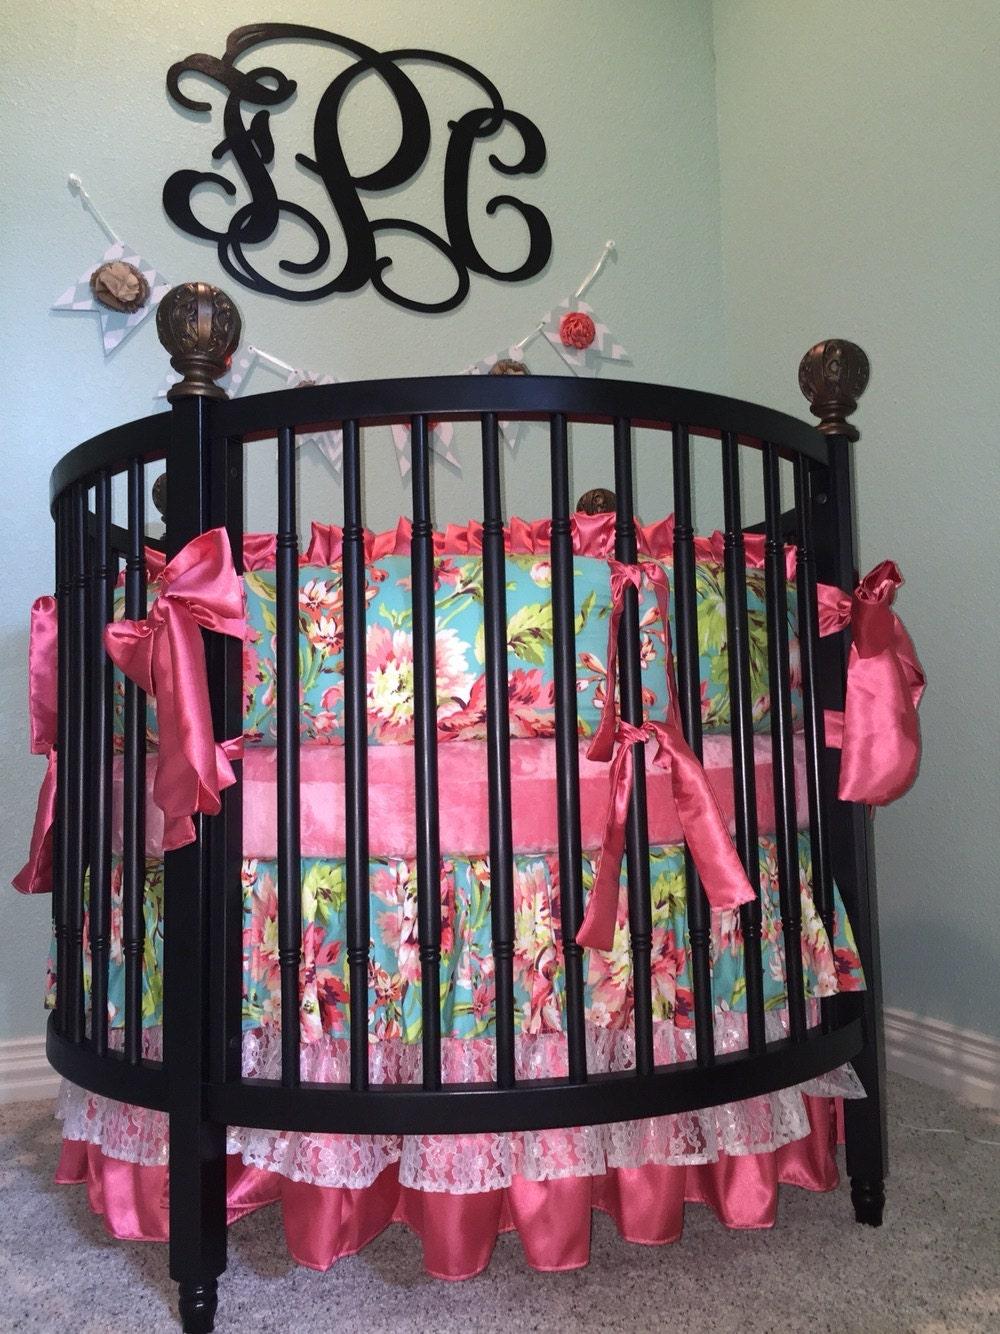 Baby cribs in kenya - Round Crib Bedding Round Crib Sets For Girls Round Baby Bedding Love Bliss Crib Sets Round Baby Girl Bedding Round Crib Bedding Sets